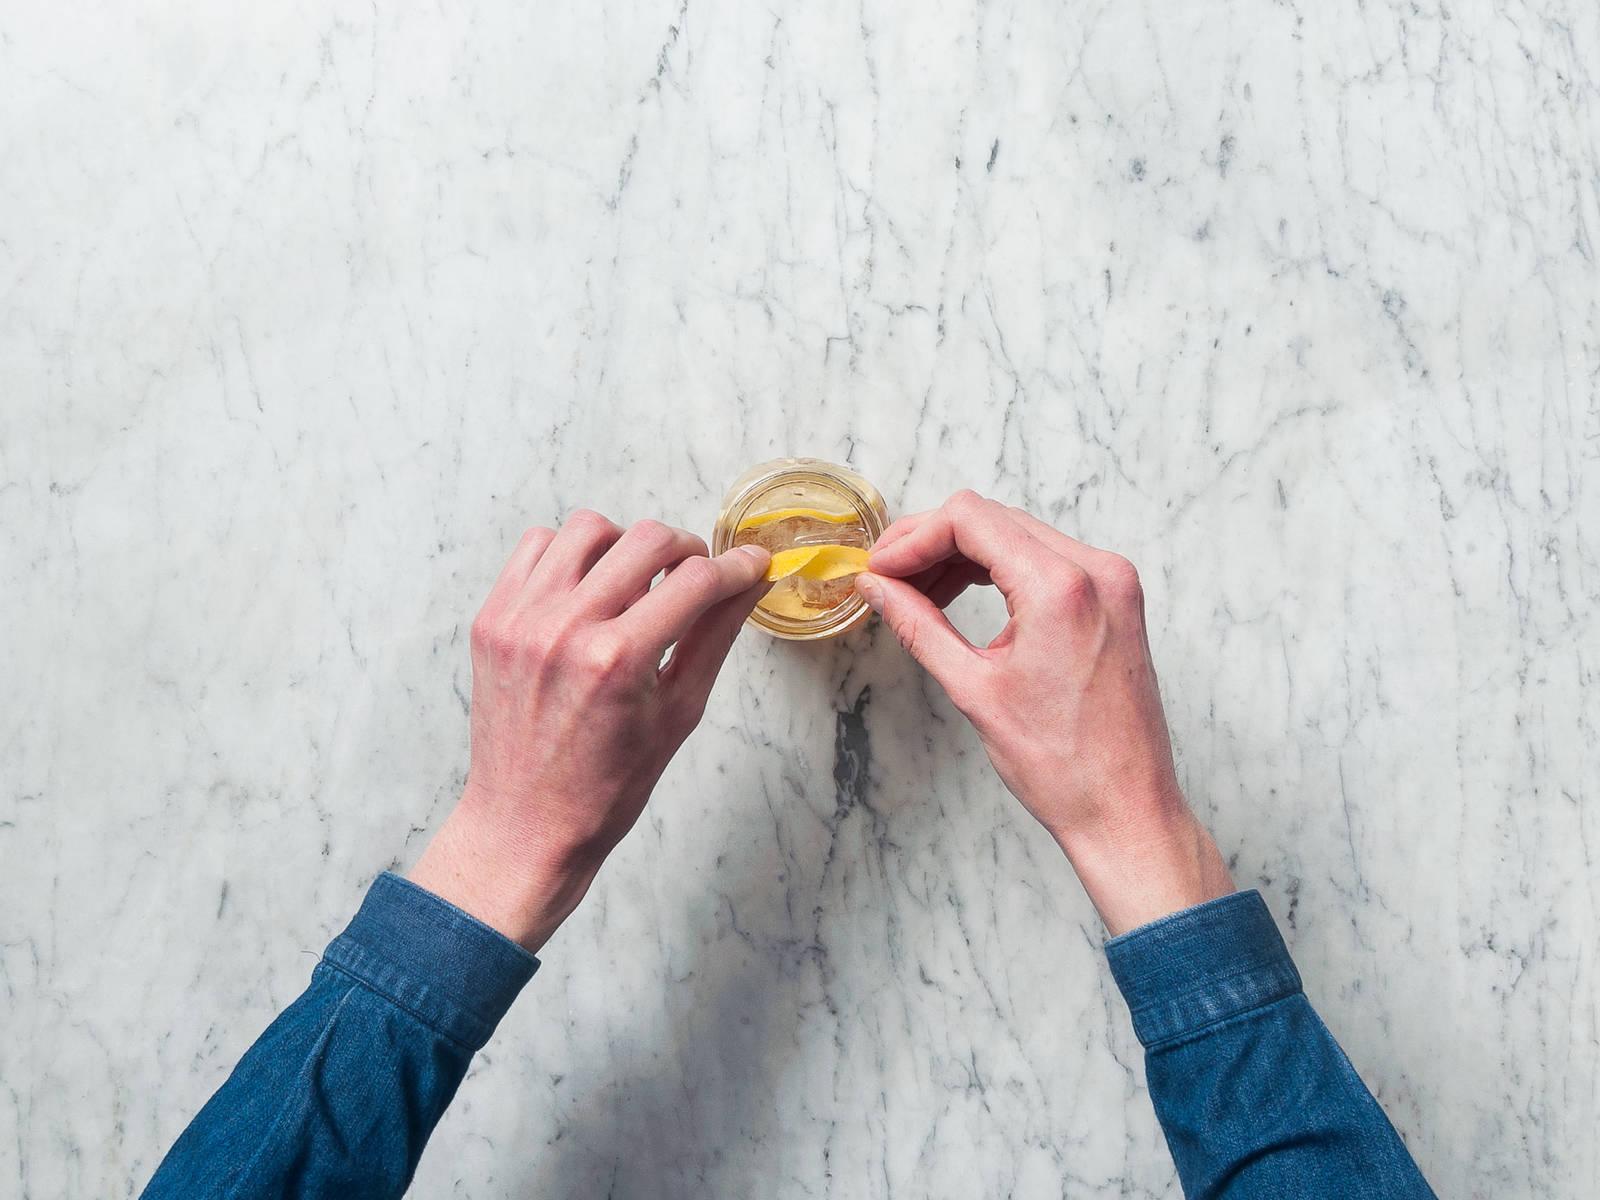 Garnish with lemon zest or lemon slice. Cheers!